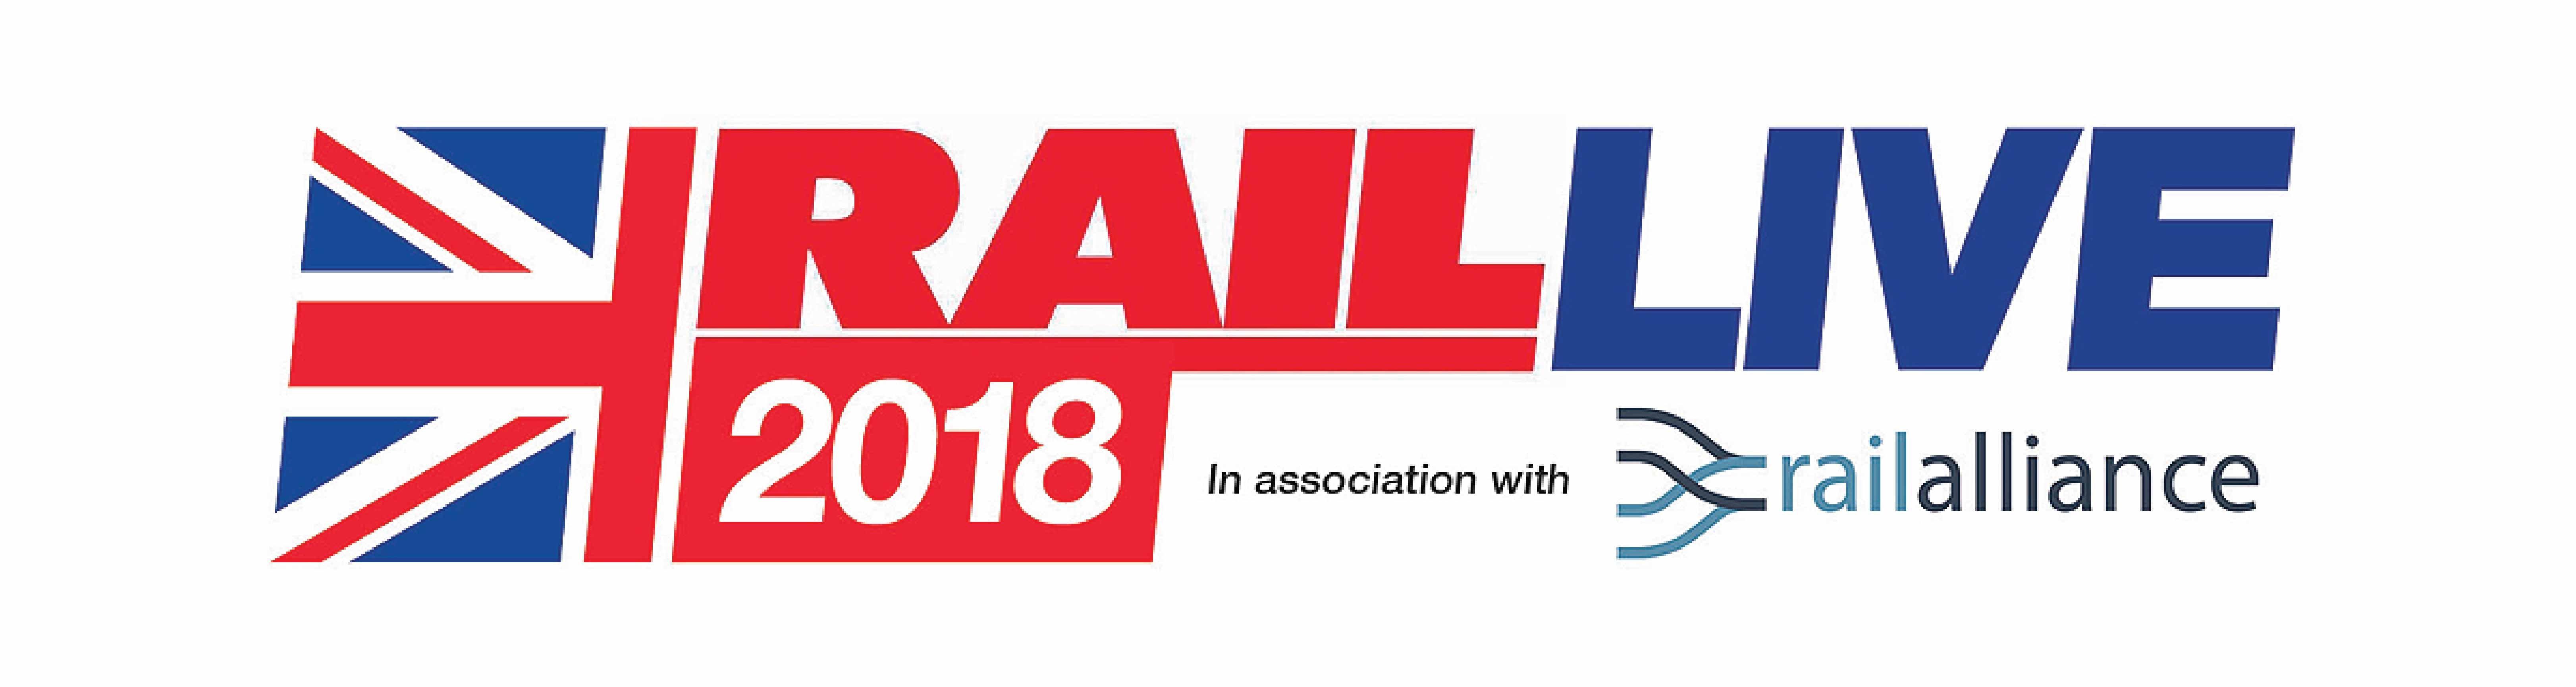 Rail Live 2018_news